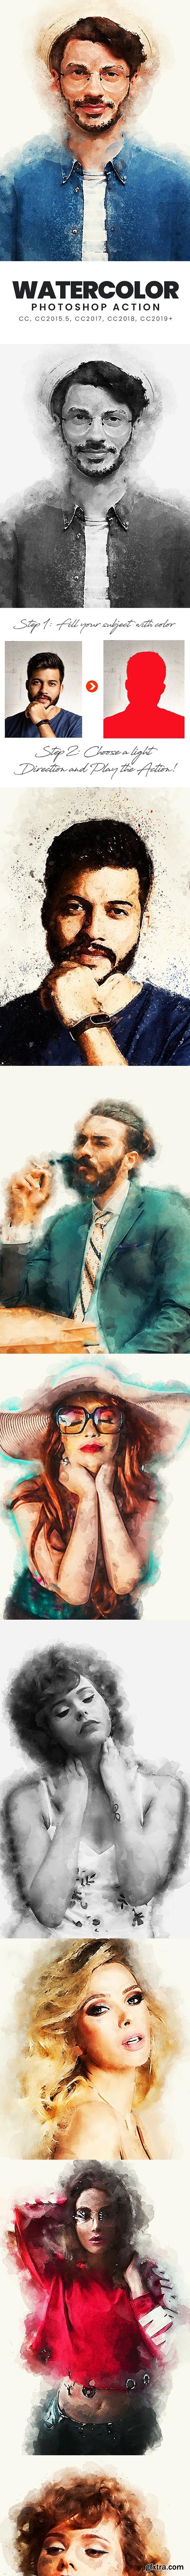 GraphicRiver - Watercolor Photoshop Action 33396288